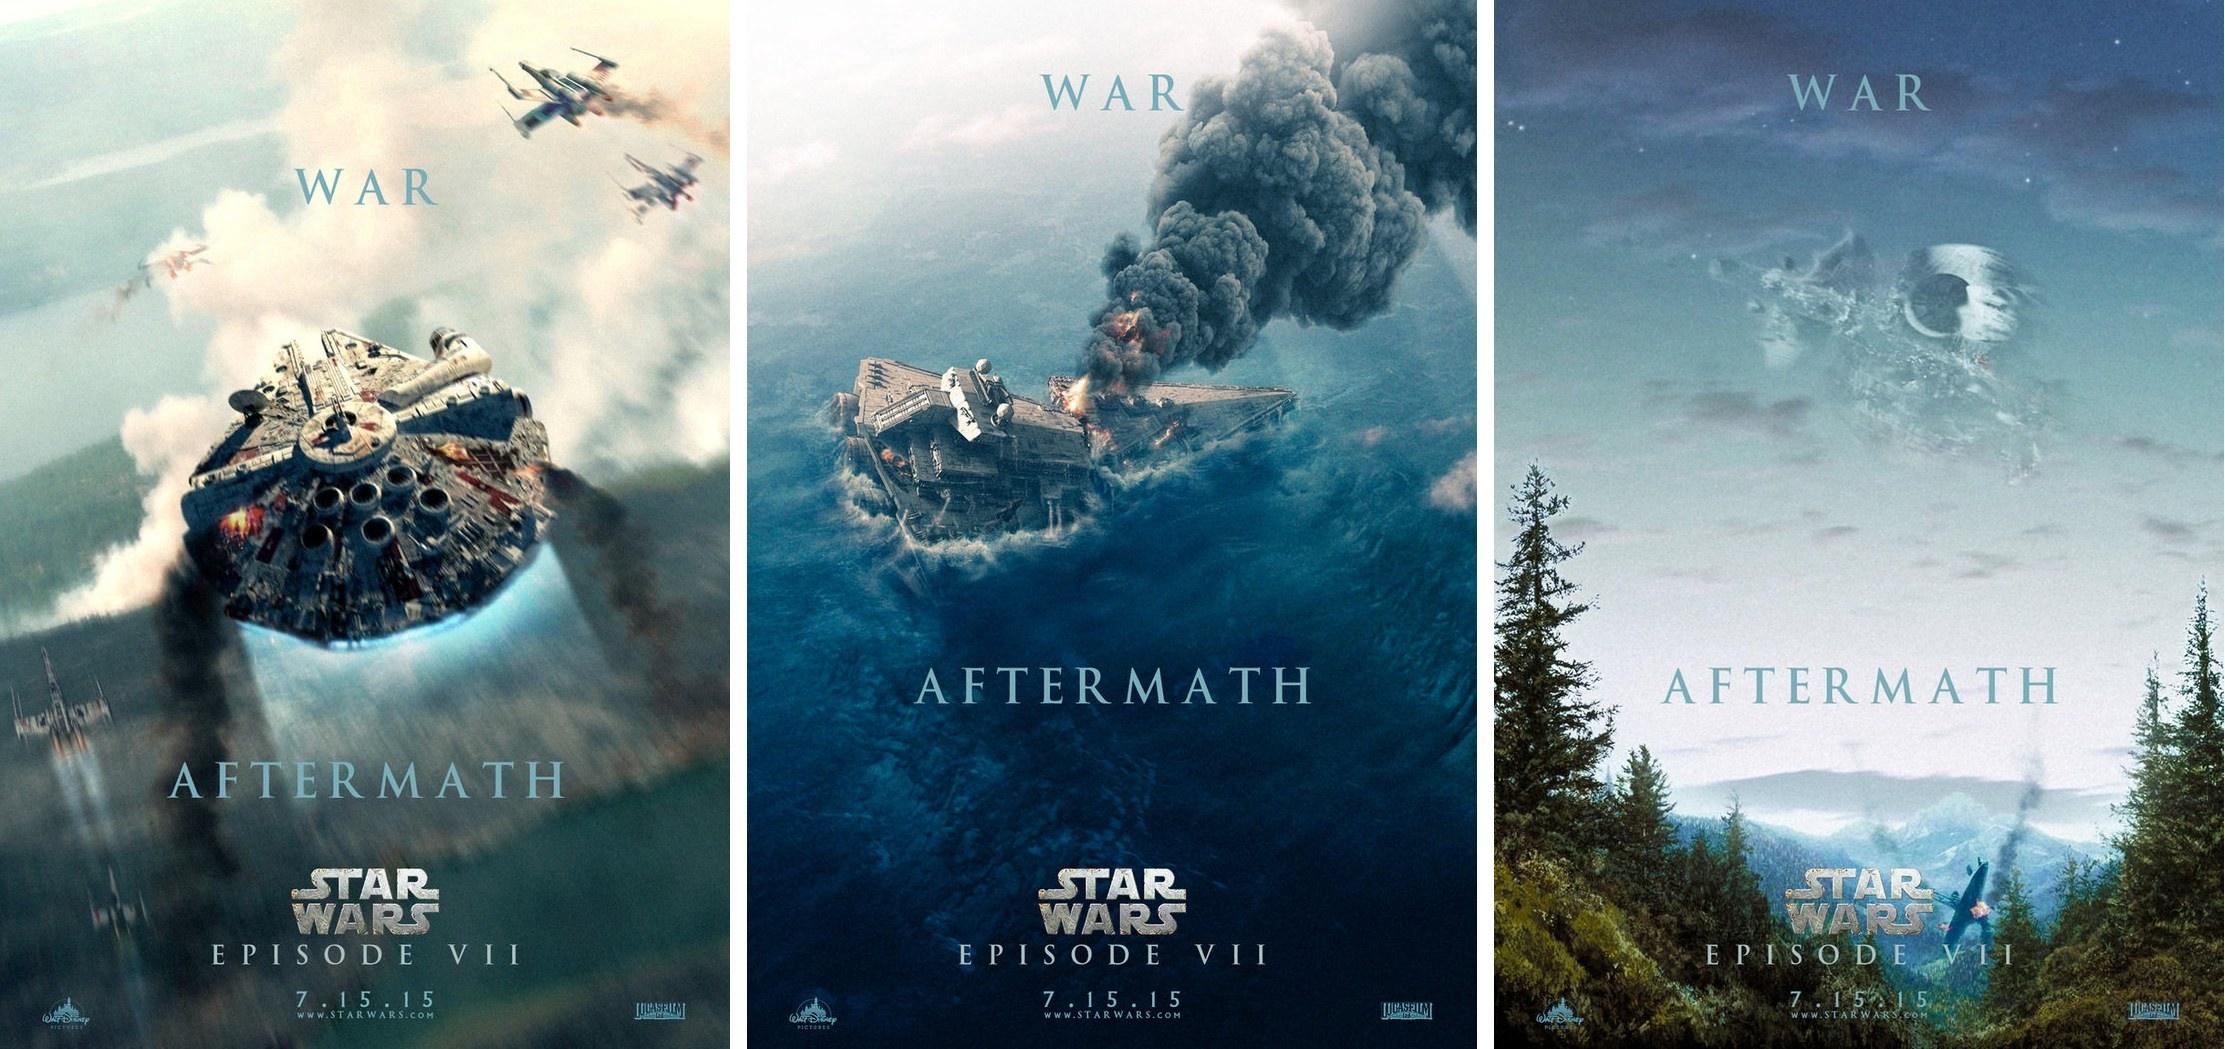 General 2225x1049 Star Wars collage artwork Millennium Falcon Star Destroyer Death Star digital art fan art X-wing Star  Destroyer movies